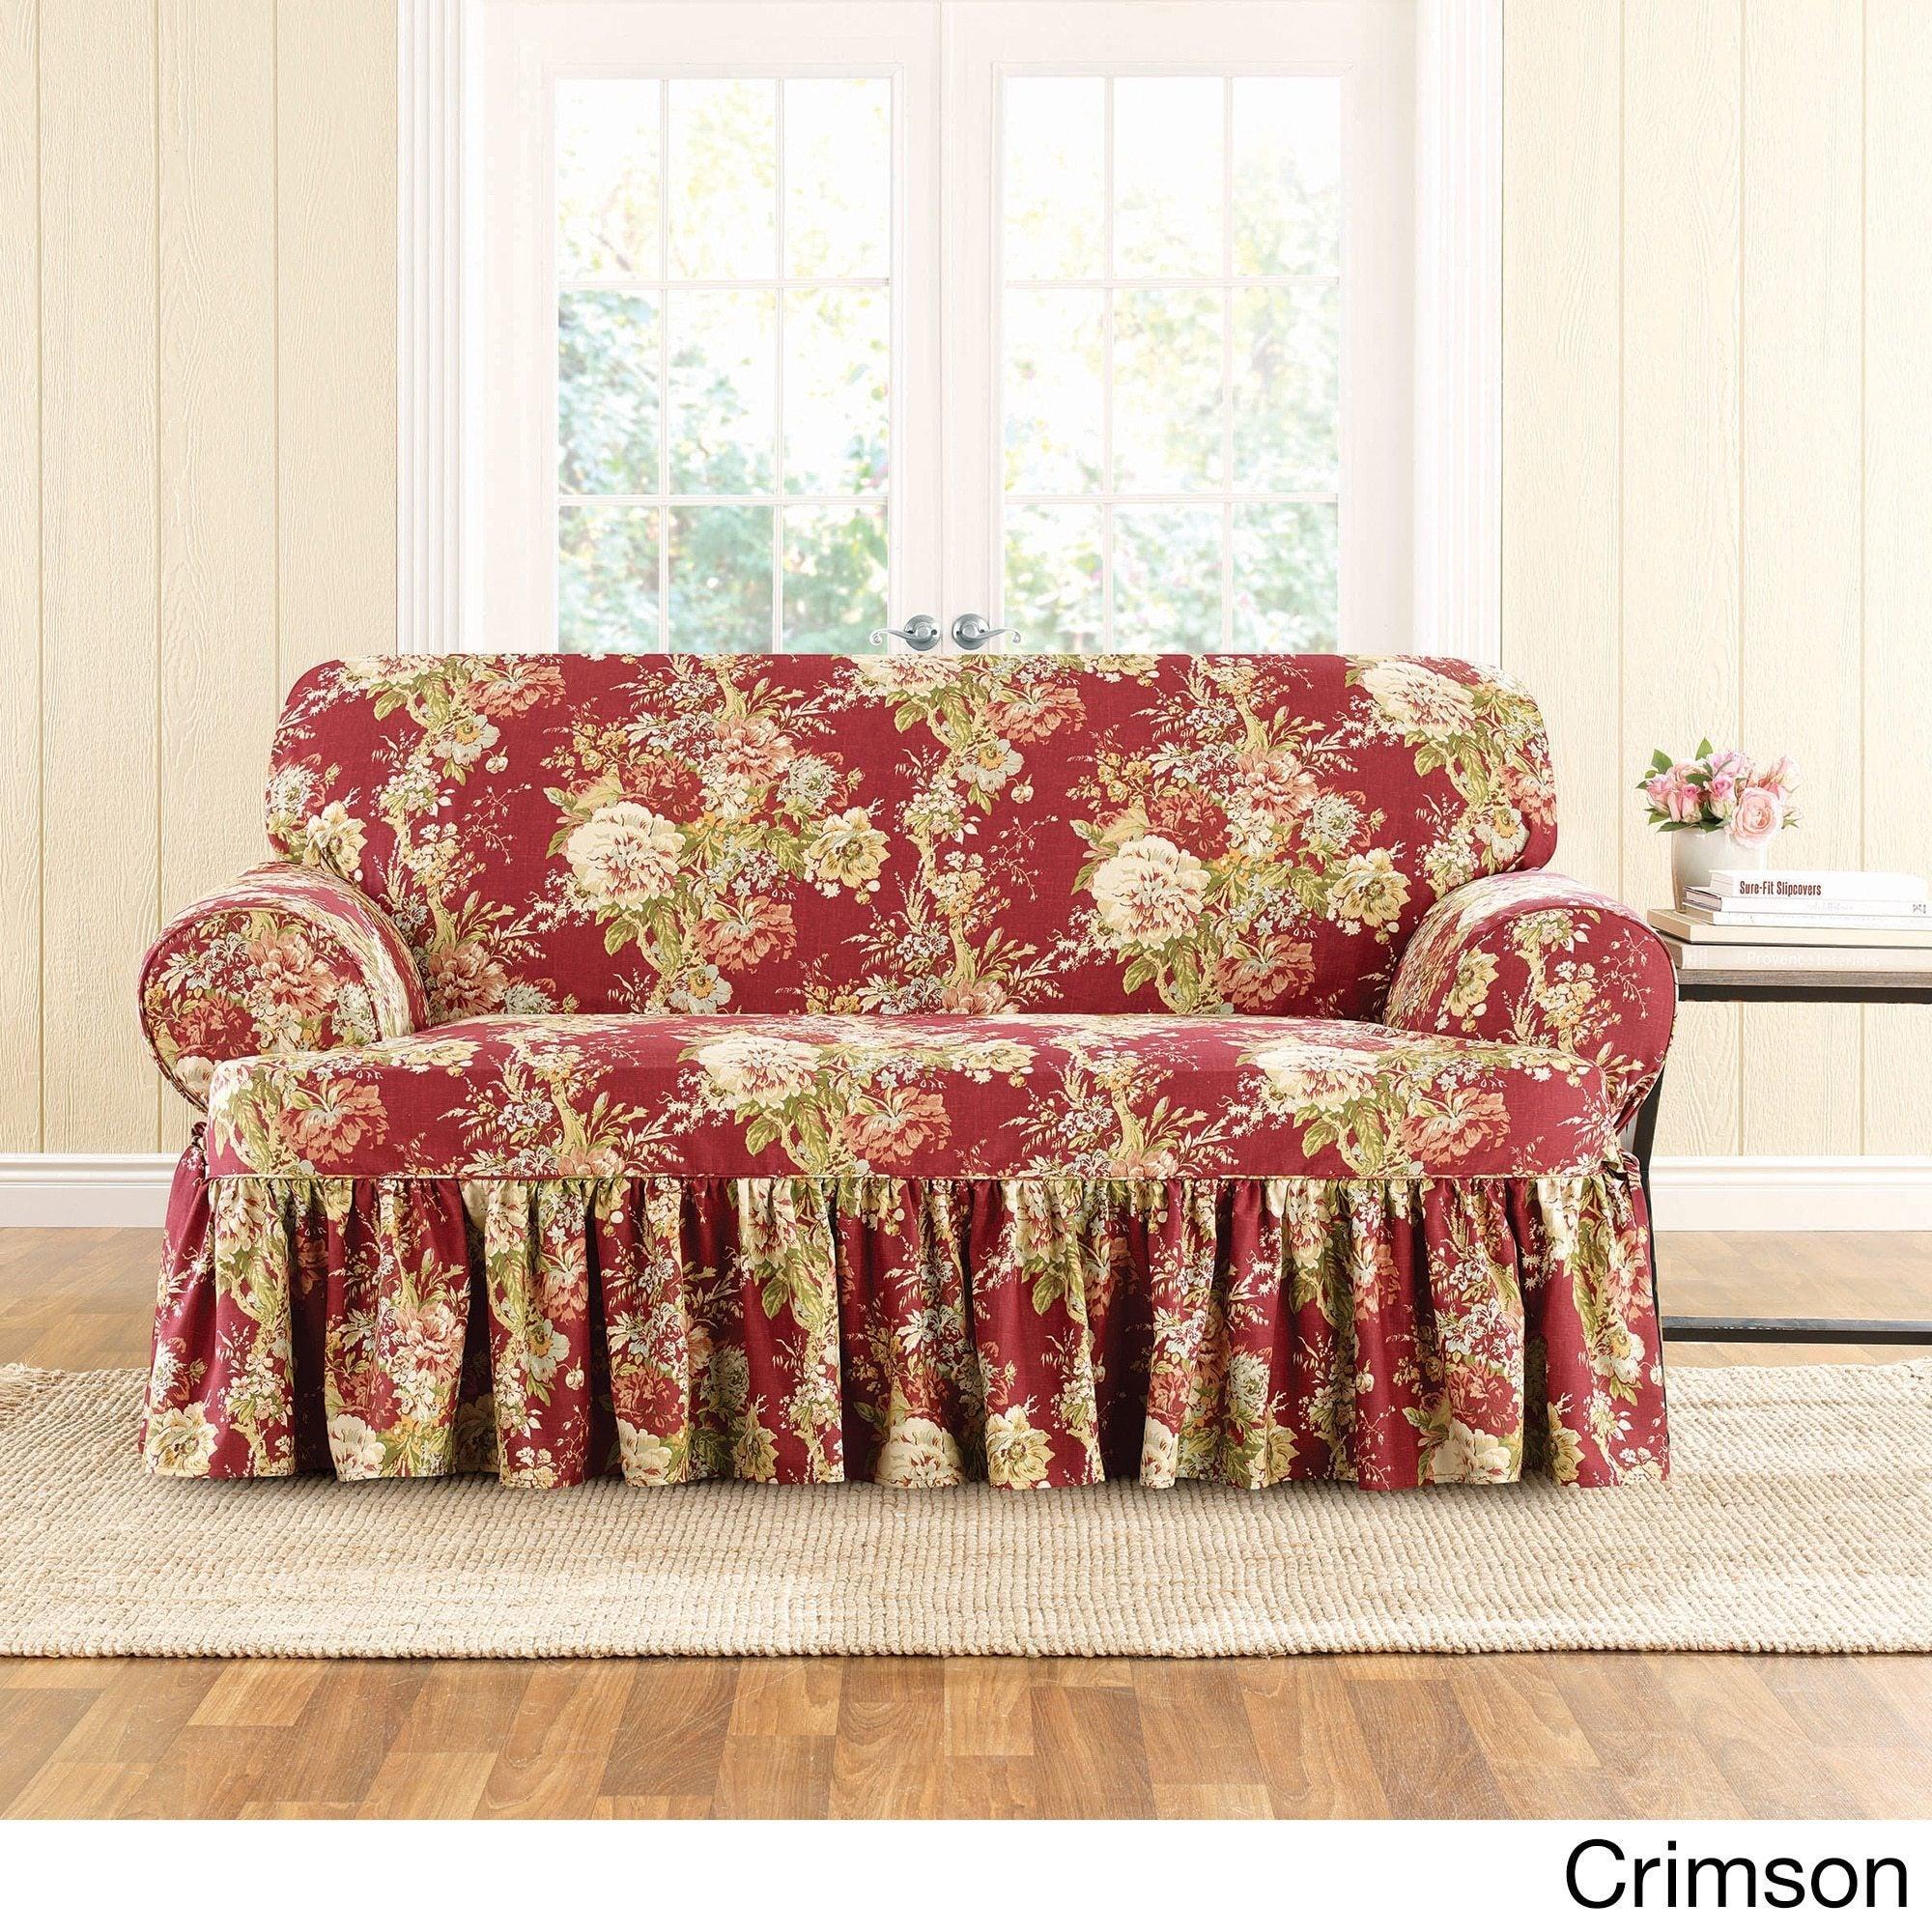 Terrific Sure Fit Ballad Bouquet Loveseat T Cushion Skirted Slipcover Theyellowbook Wood Chair Design Ideas Theyellowbookinfo